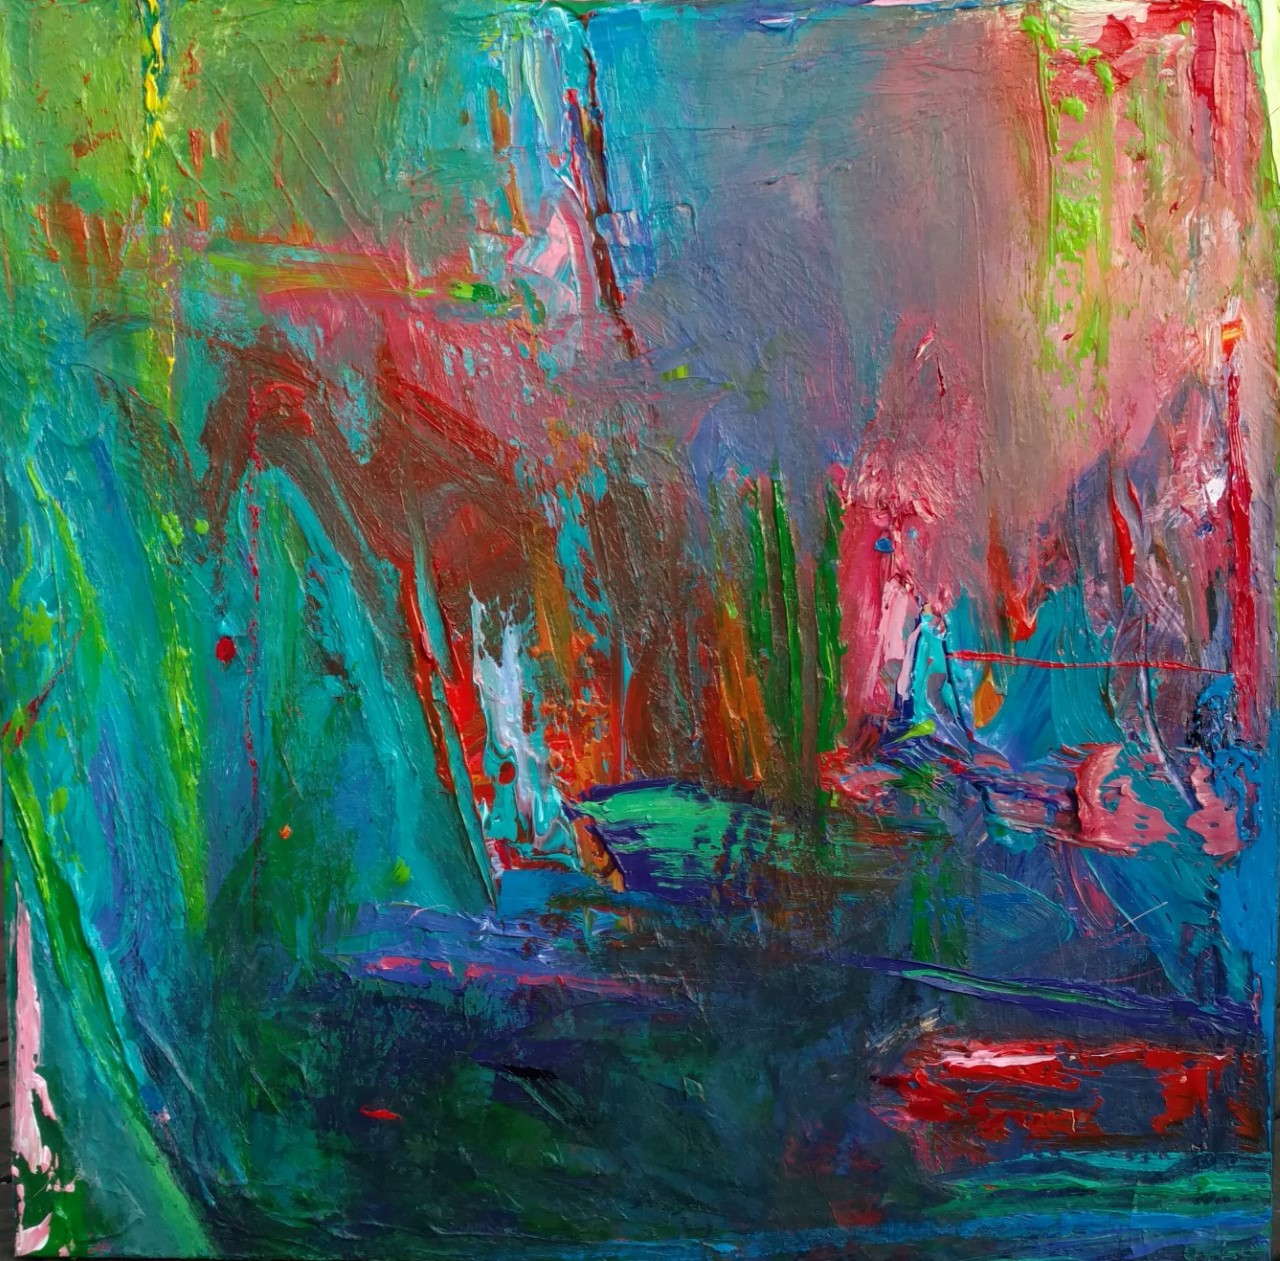 """Alive"" 38x38 acrylic on canvas"